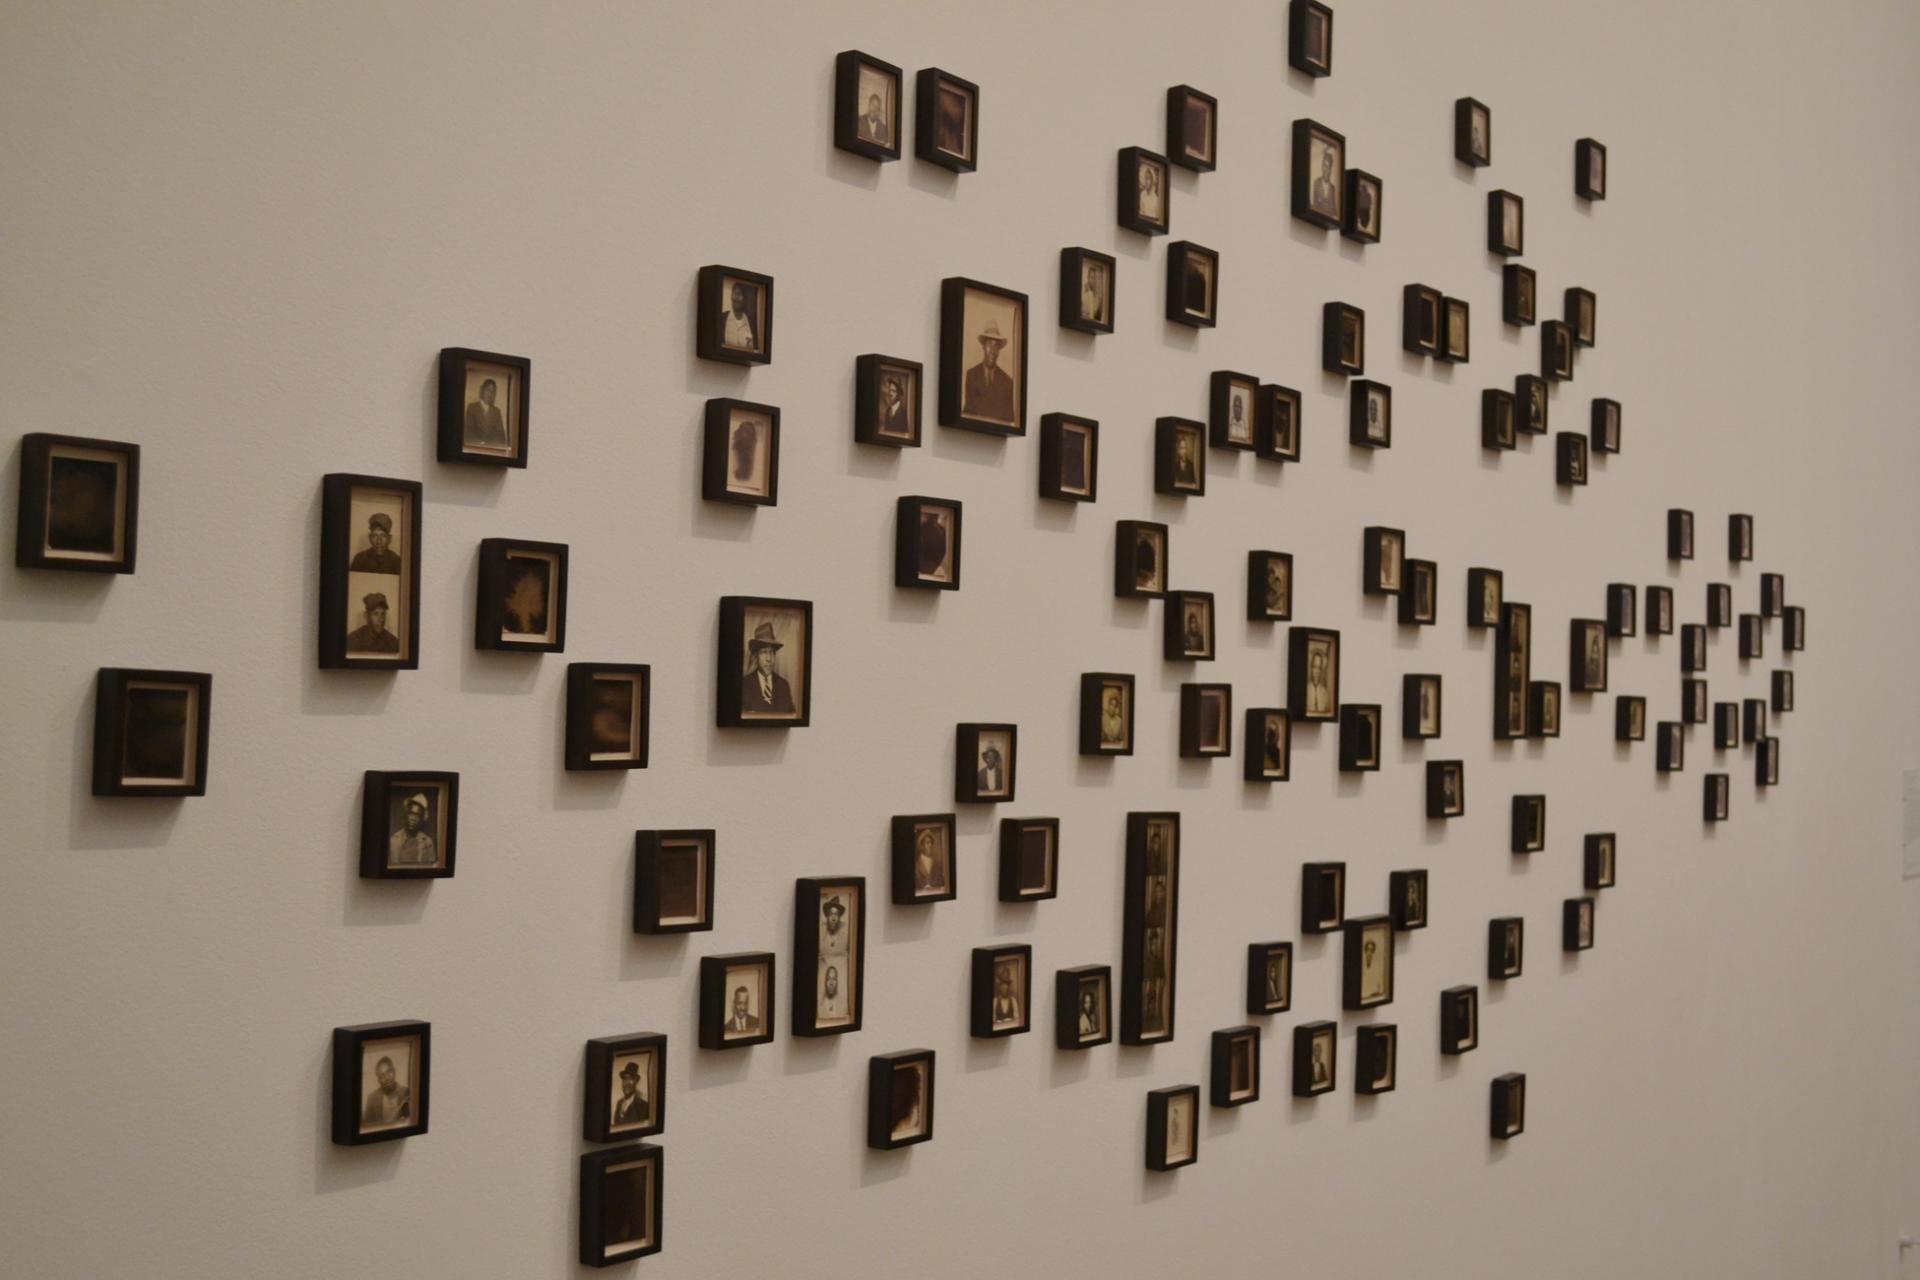 Arte en el Tate Modern